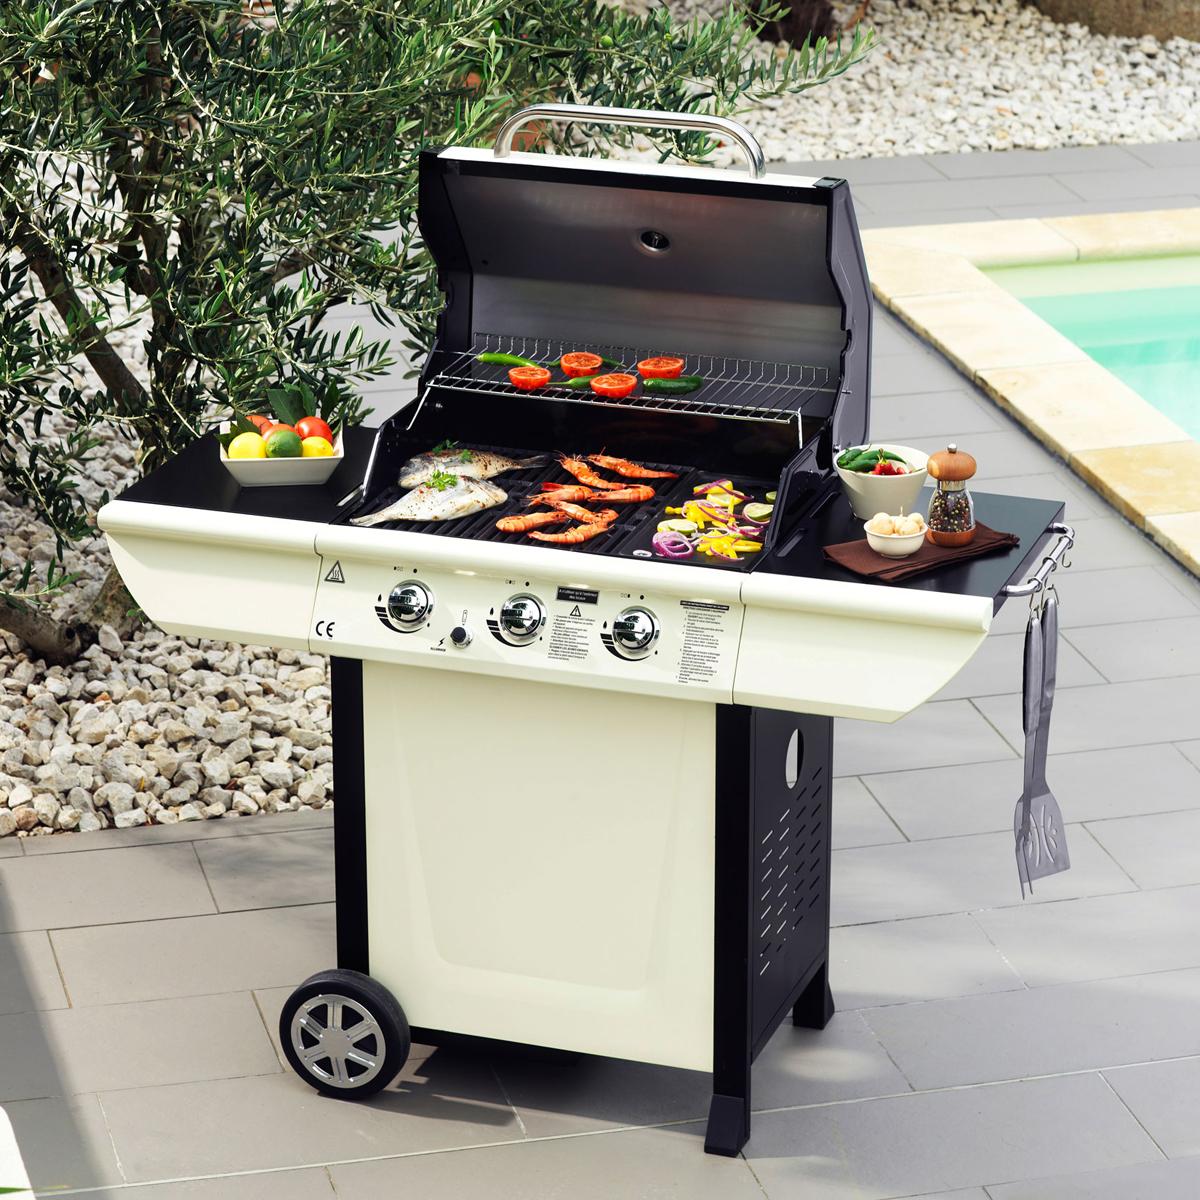 100 Incroyable Suggestions Barbecue Electrique Ou Gaz